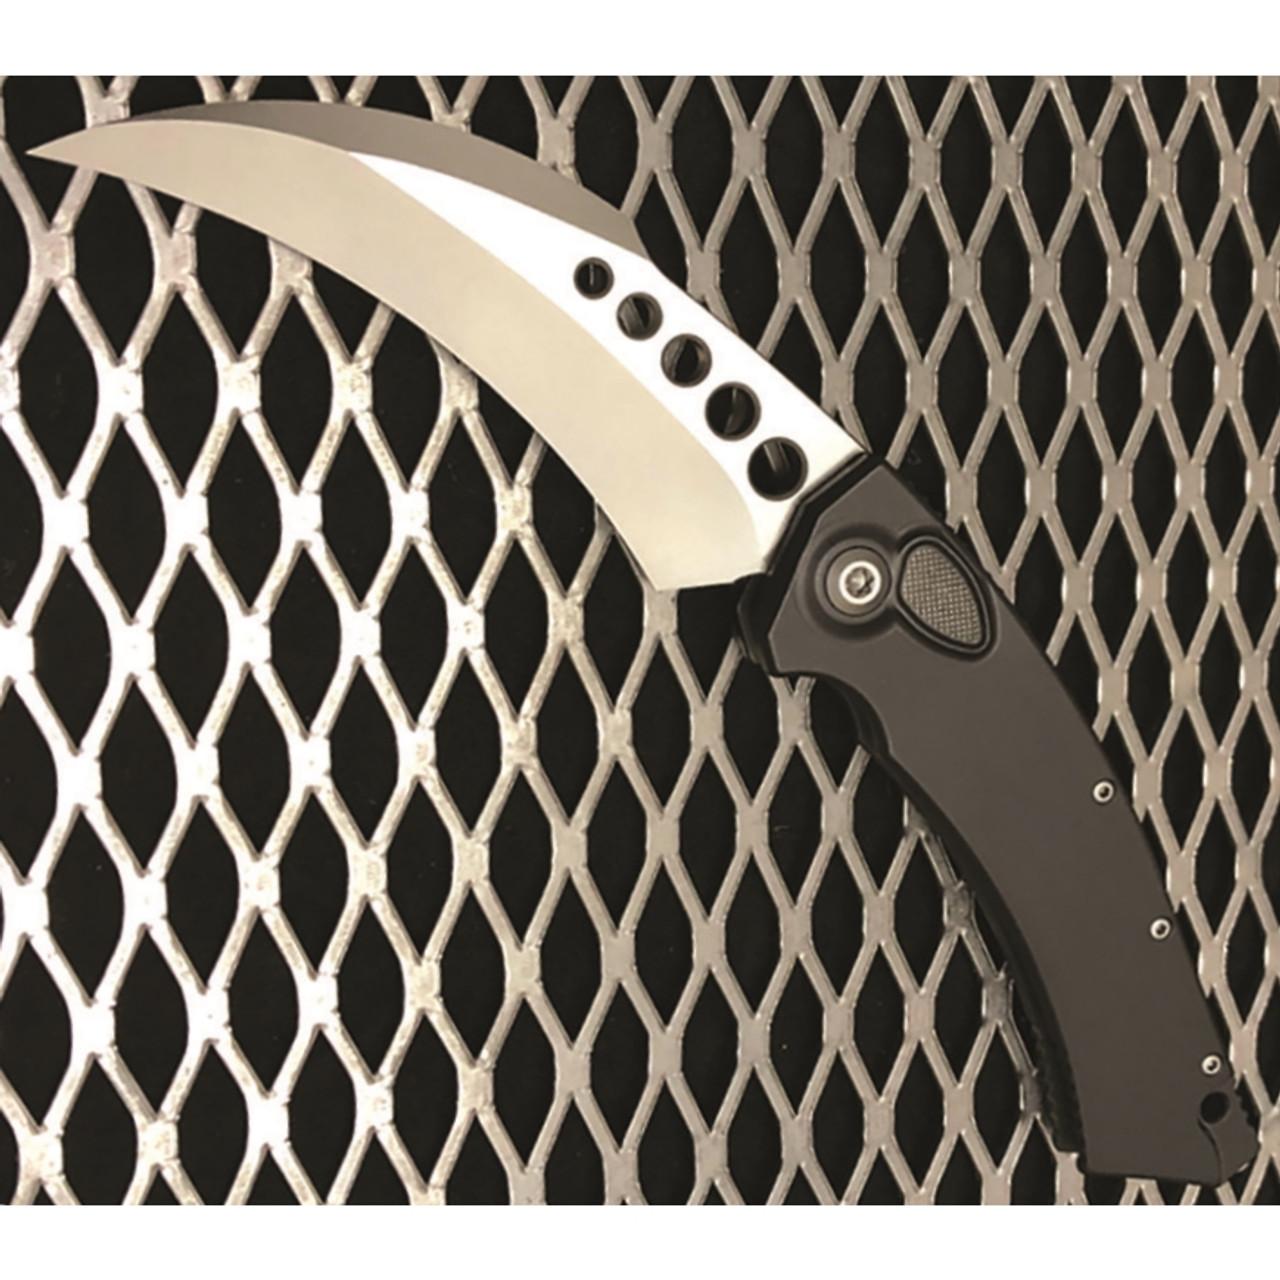 Microtech Hawk Auto Knife, Stonewash Blade, On Grid